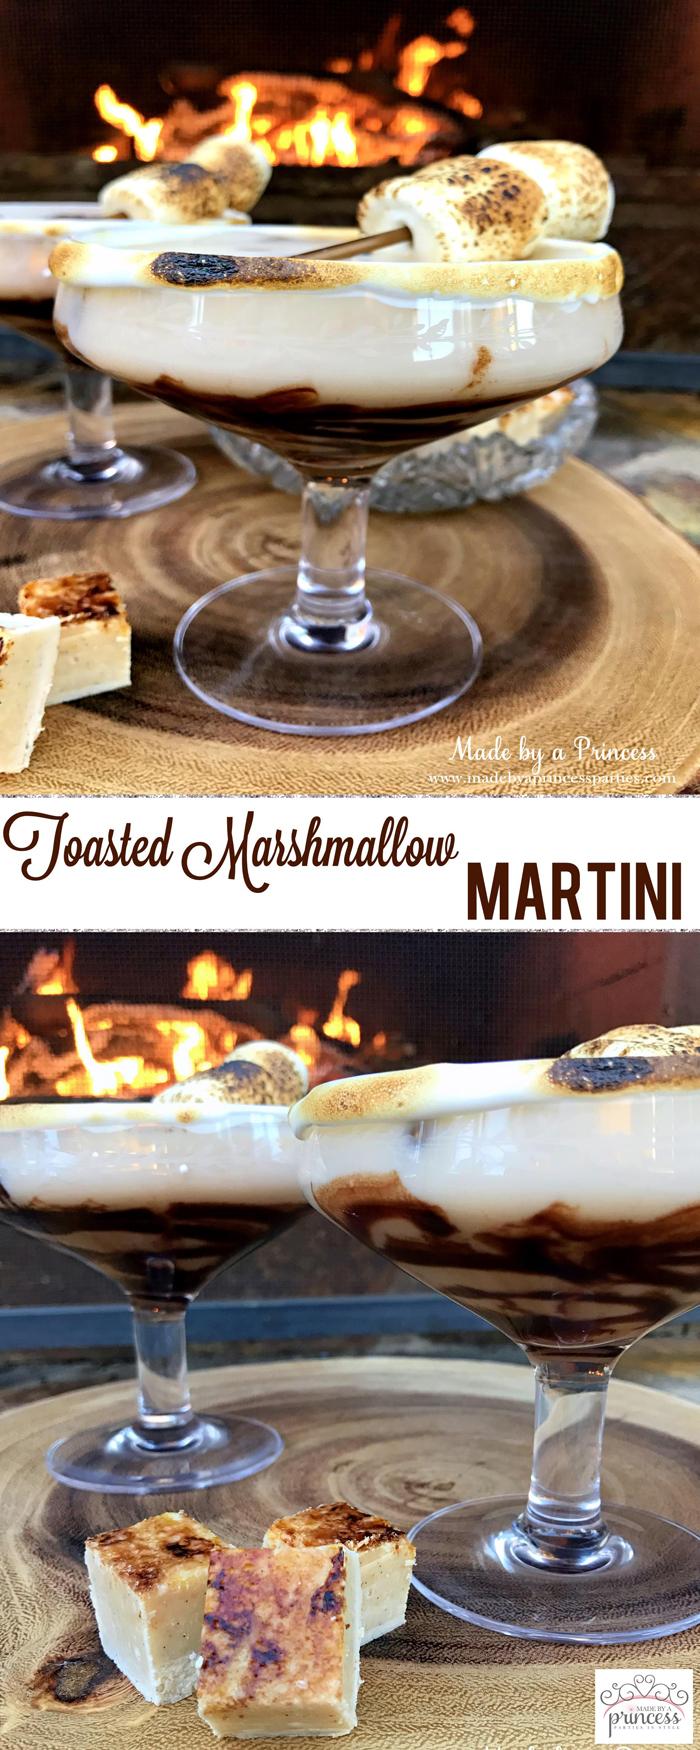 dark-chocolate-toasted-marshmallow-martini-pin-it